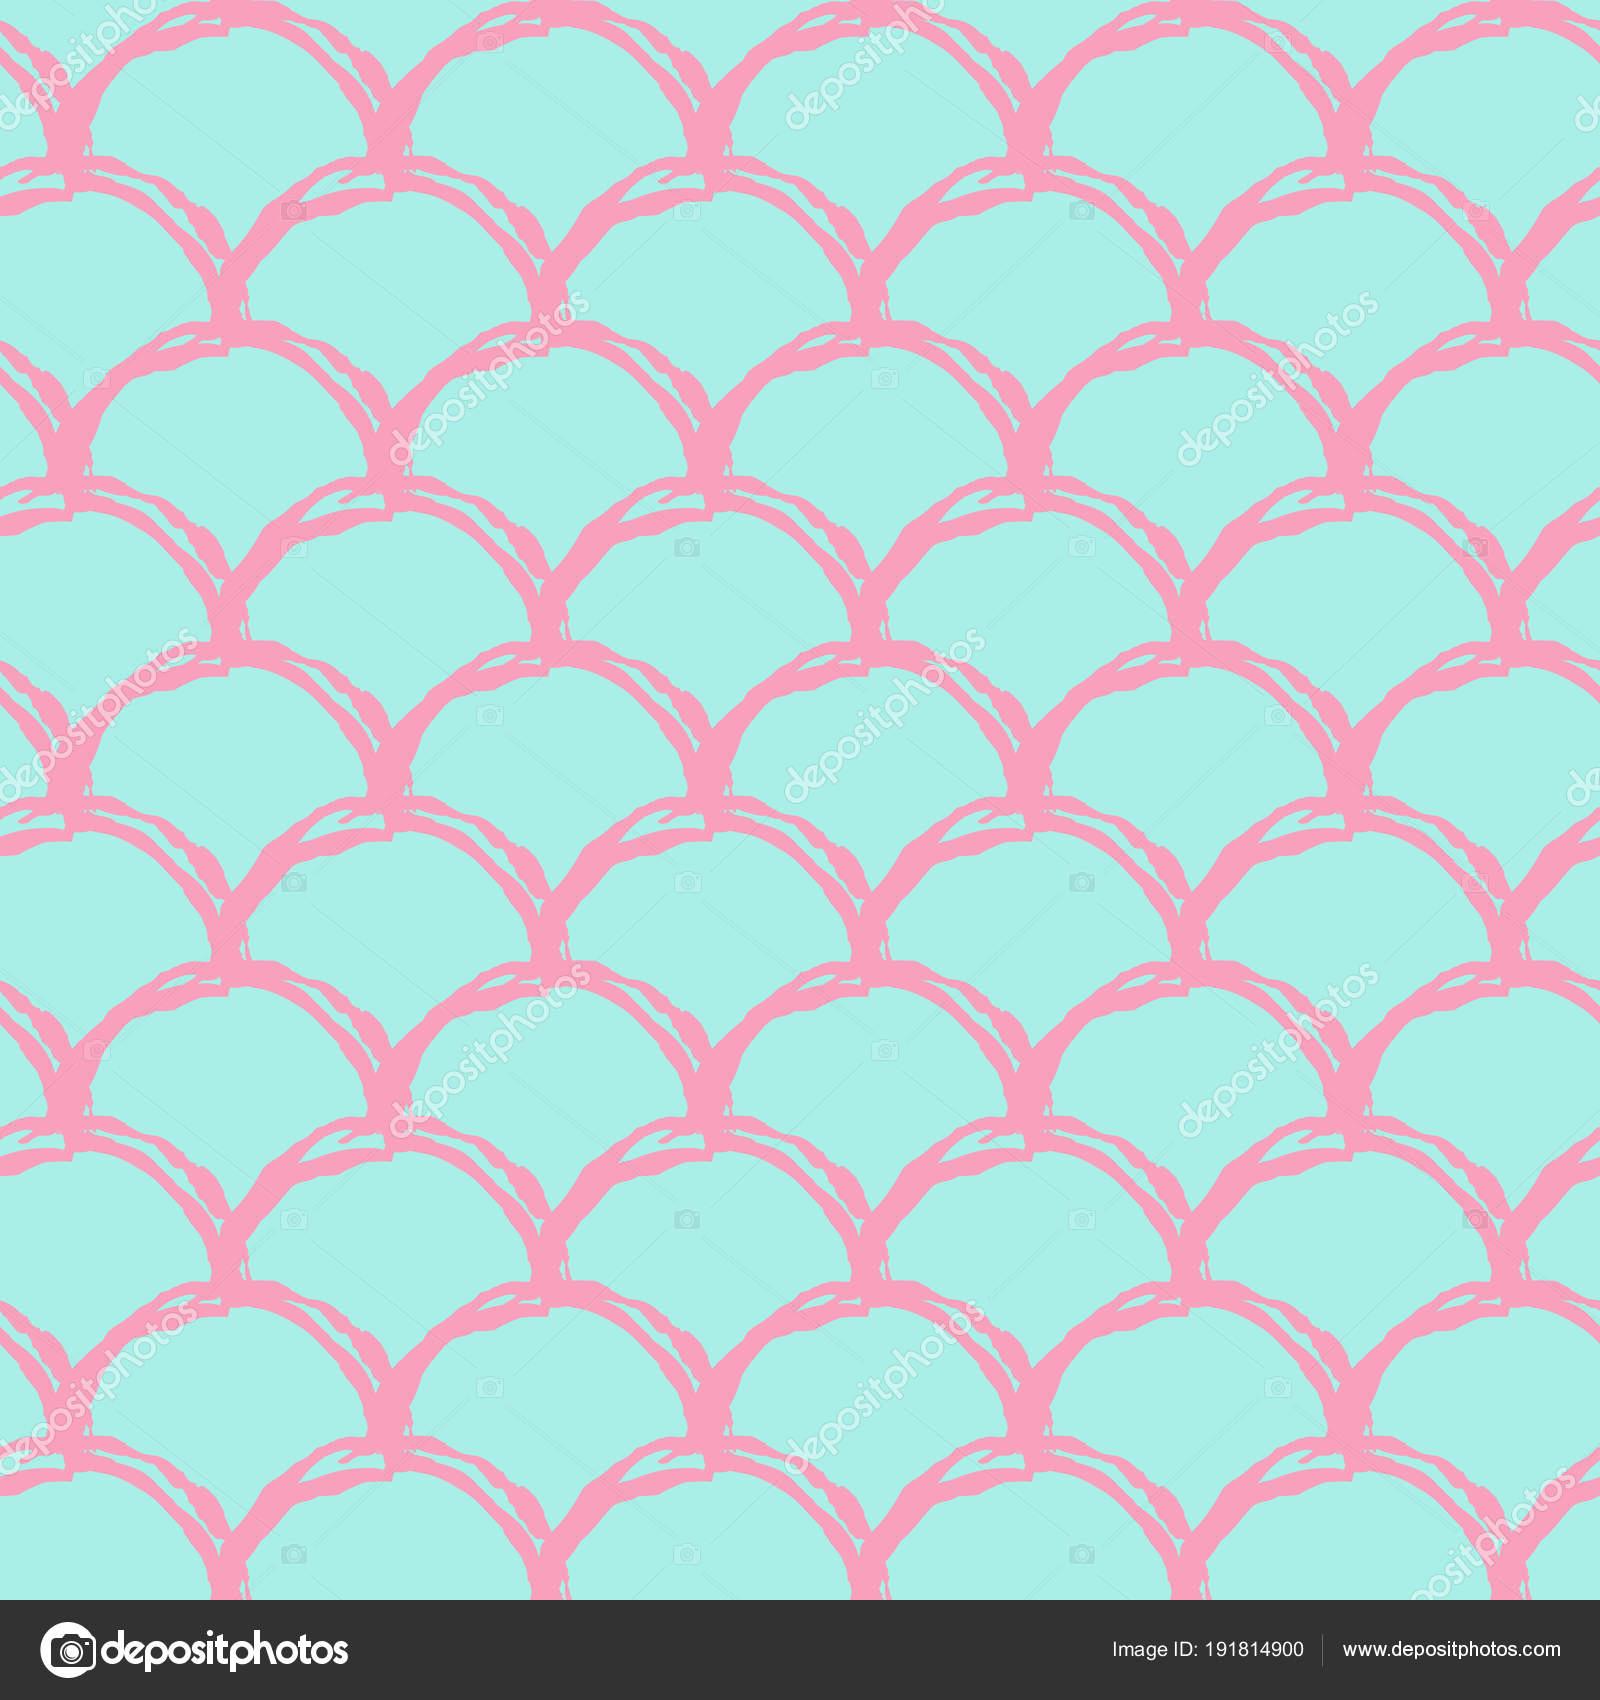 Mermaid Tail Wallpaper Mermaid Tail Seamless Pattern